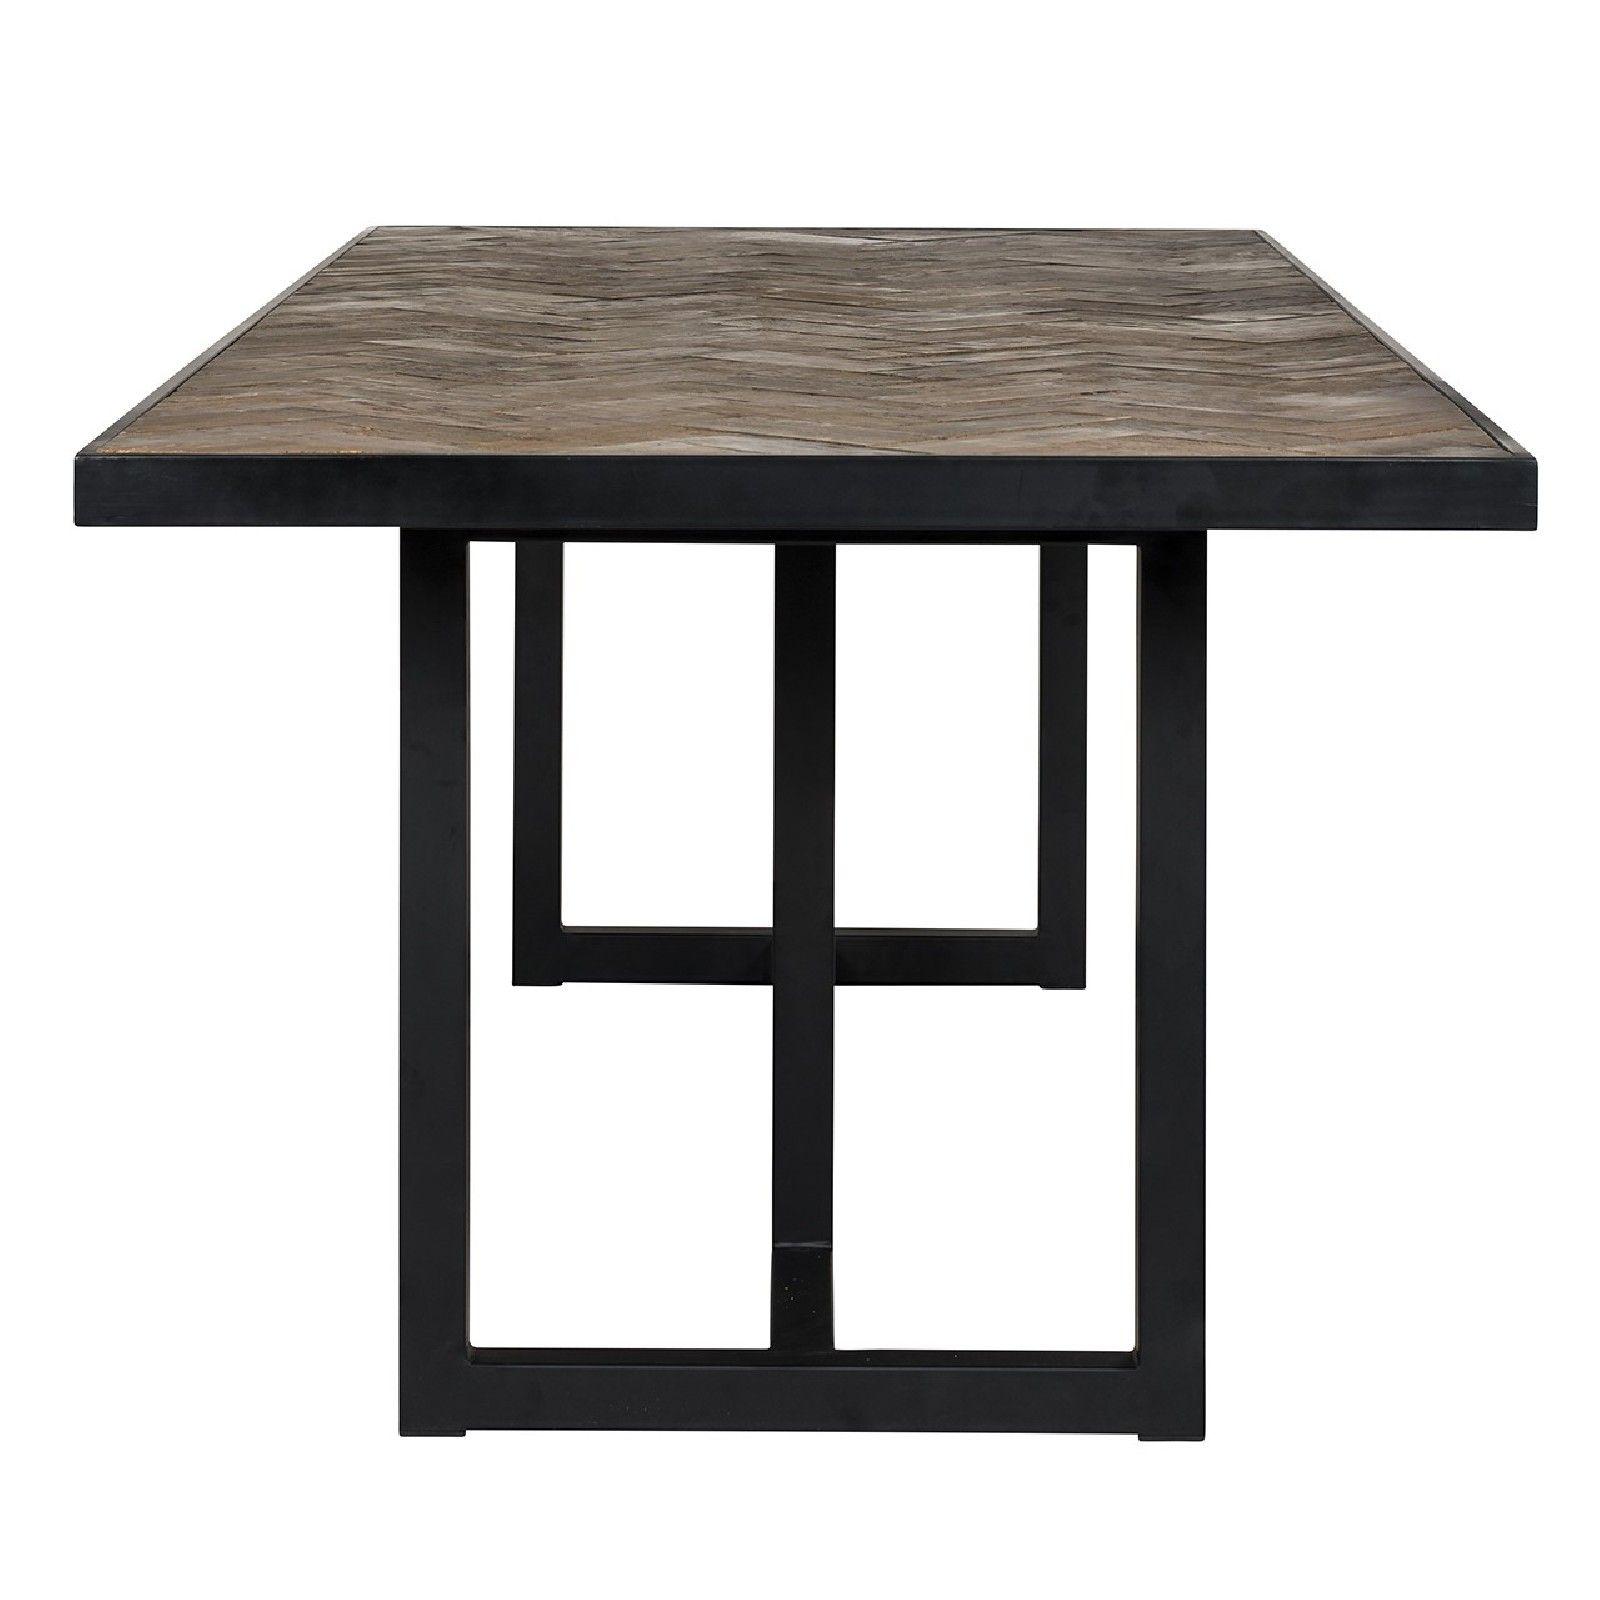 Table à dîner Herringbone 240 Meuble Déco Tendance - 229